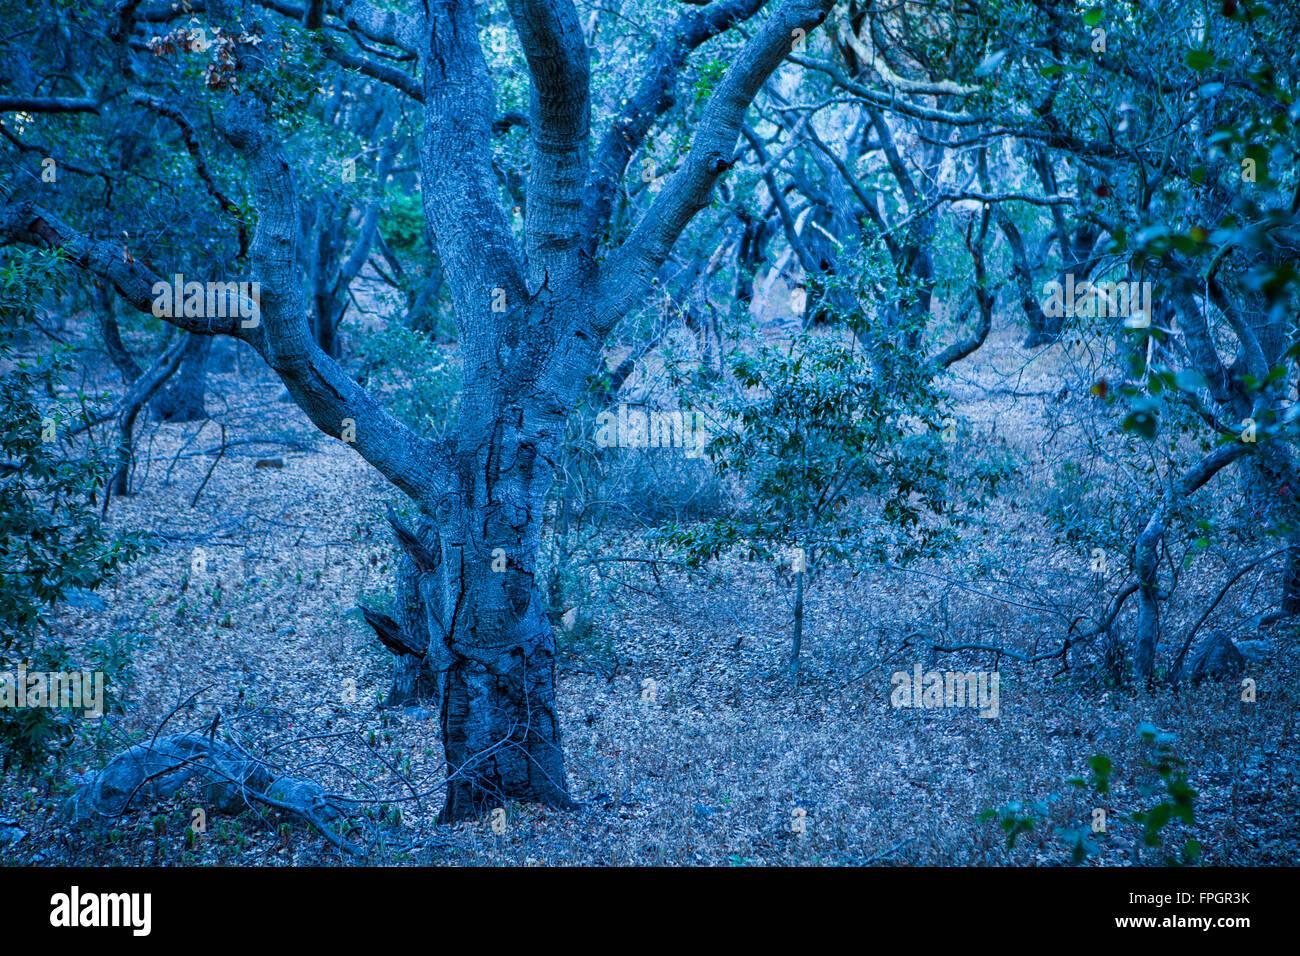 ominous oak forest, Bishop Peak, San Luis Obispo, California - Stock Image